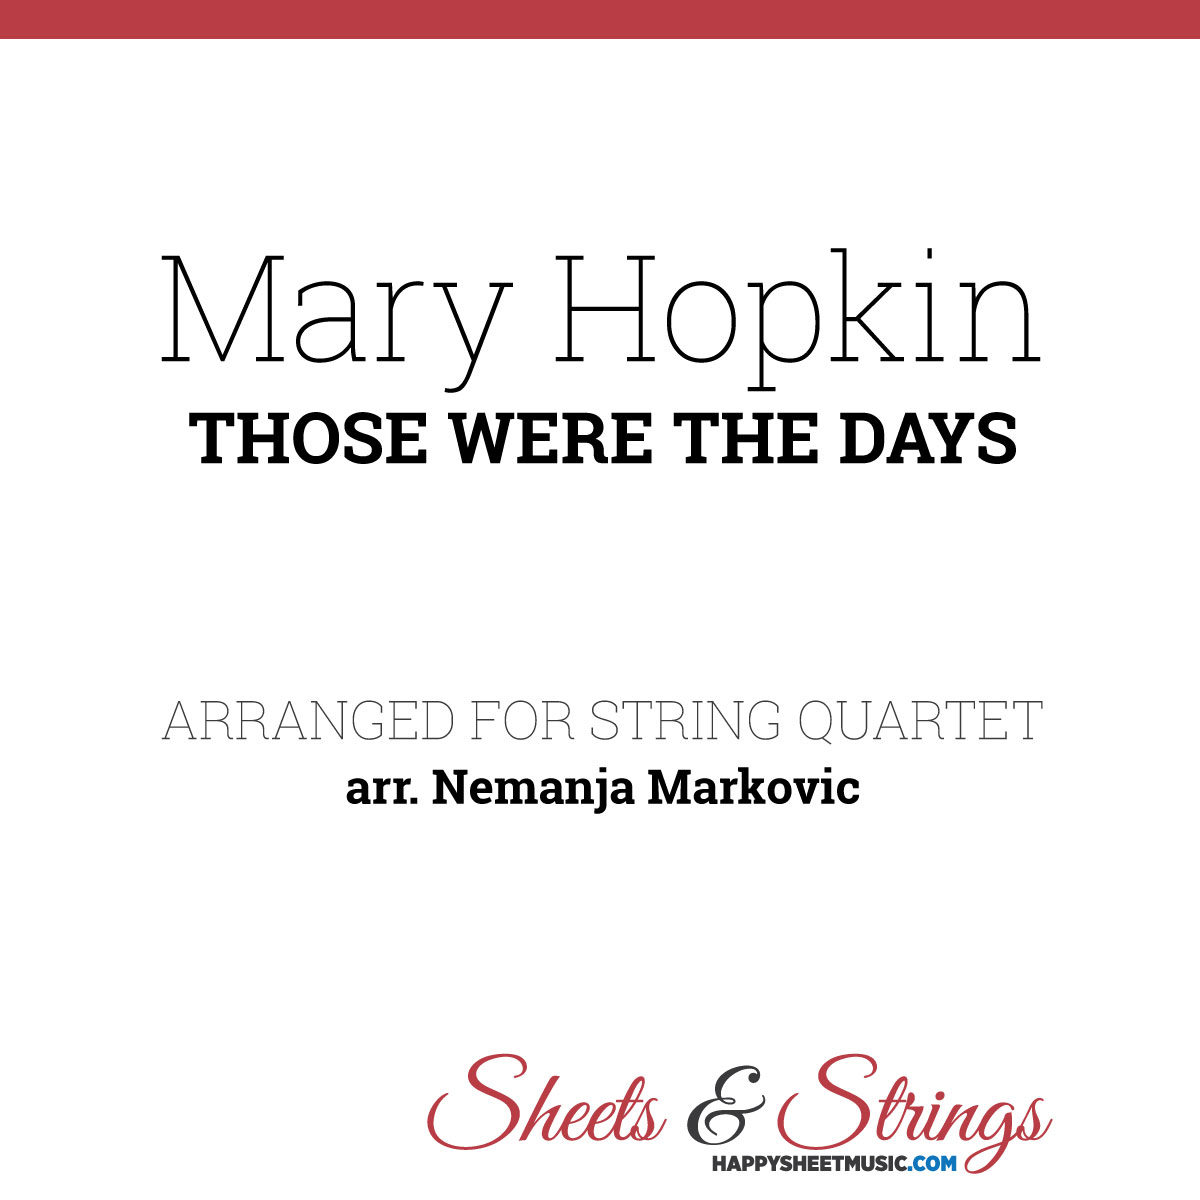 Mary Hopkin - Those Were The Days - Sheet Music for String Quartet - Music Arrangement for String Quartet